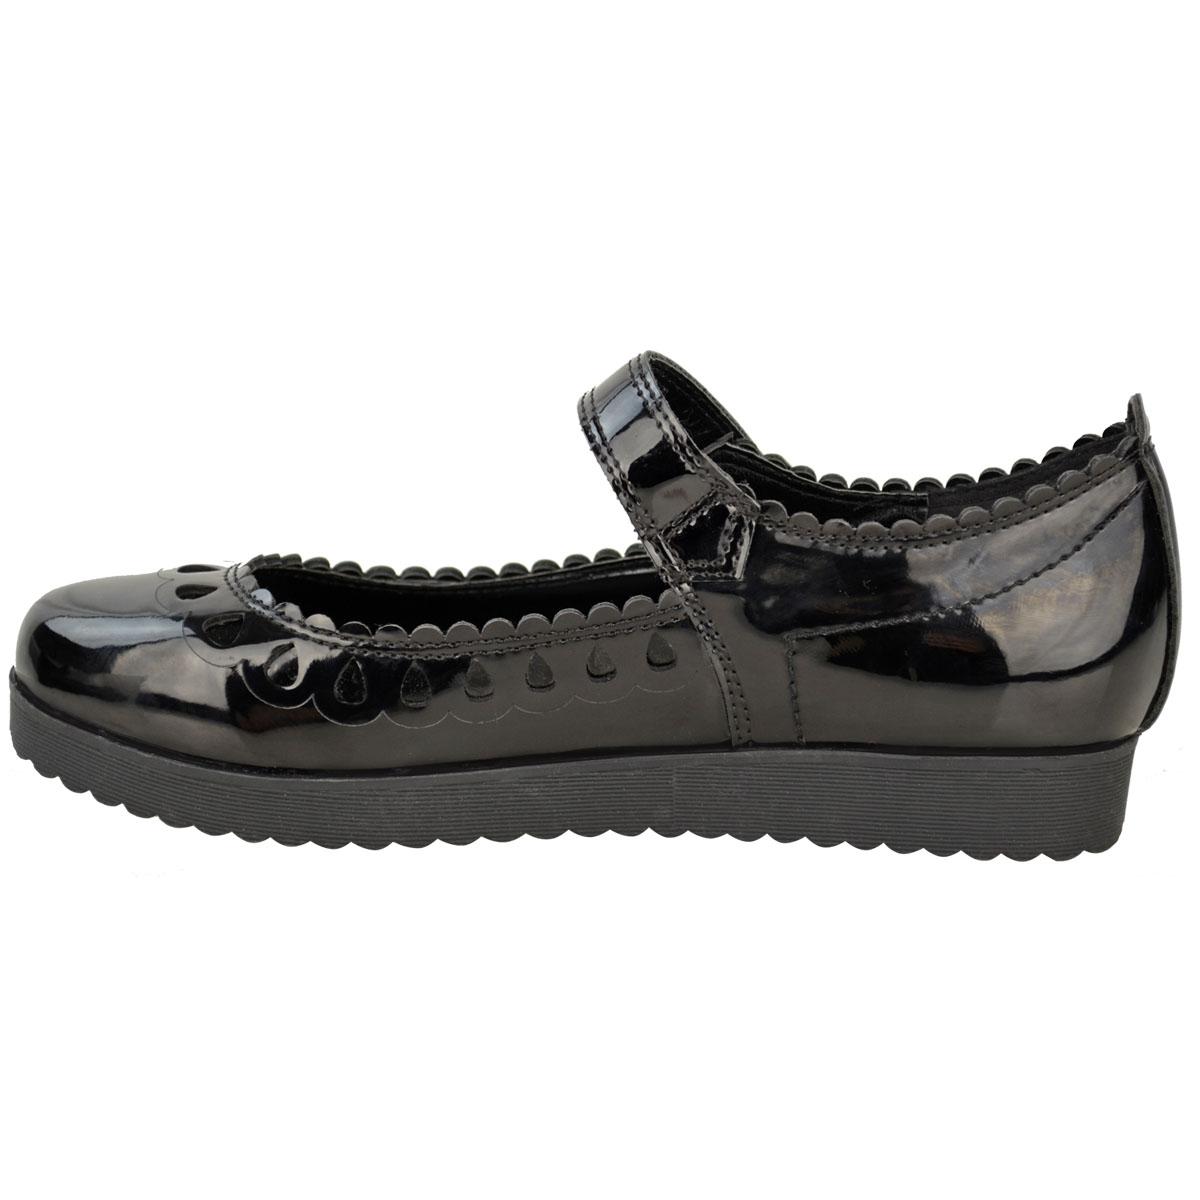 New-Womens-Ladies-Girls-Flats-Shoes-Pumps-School-Work-Office-Geek-Low-Heels-Size thumbnail 4